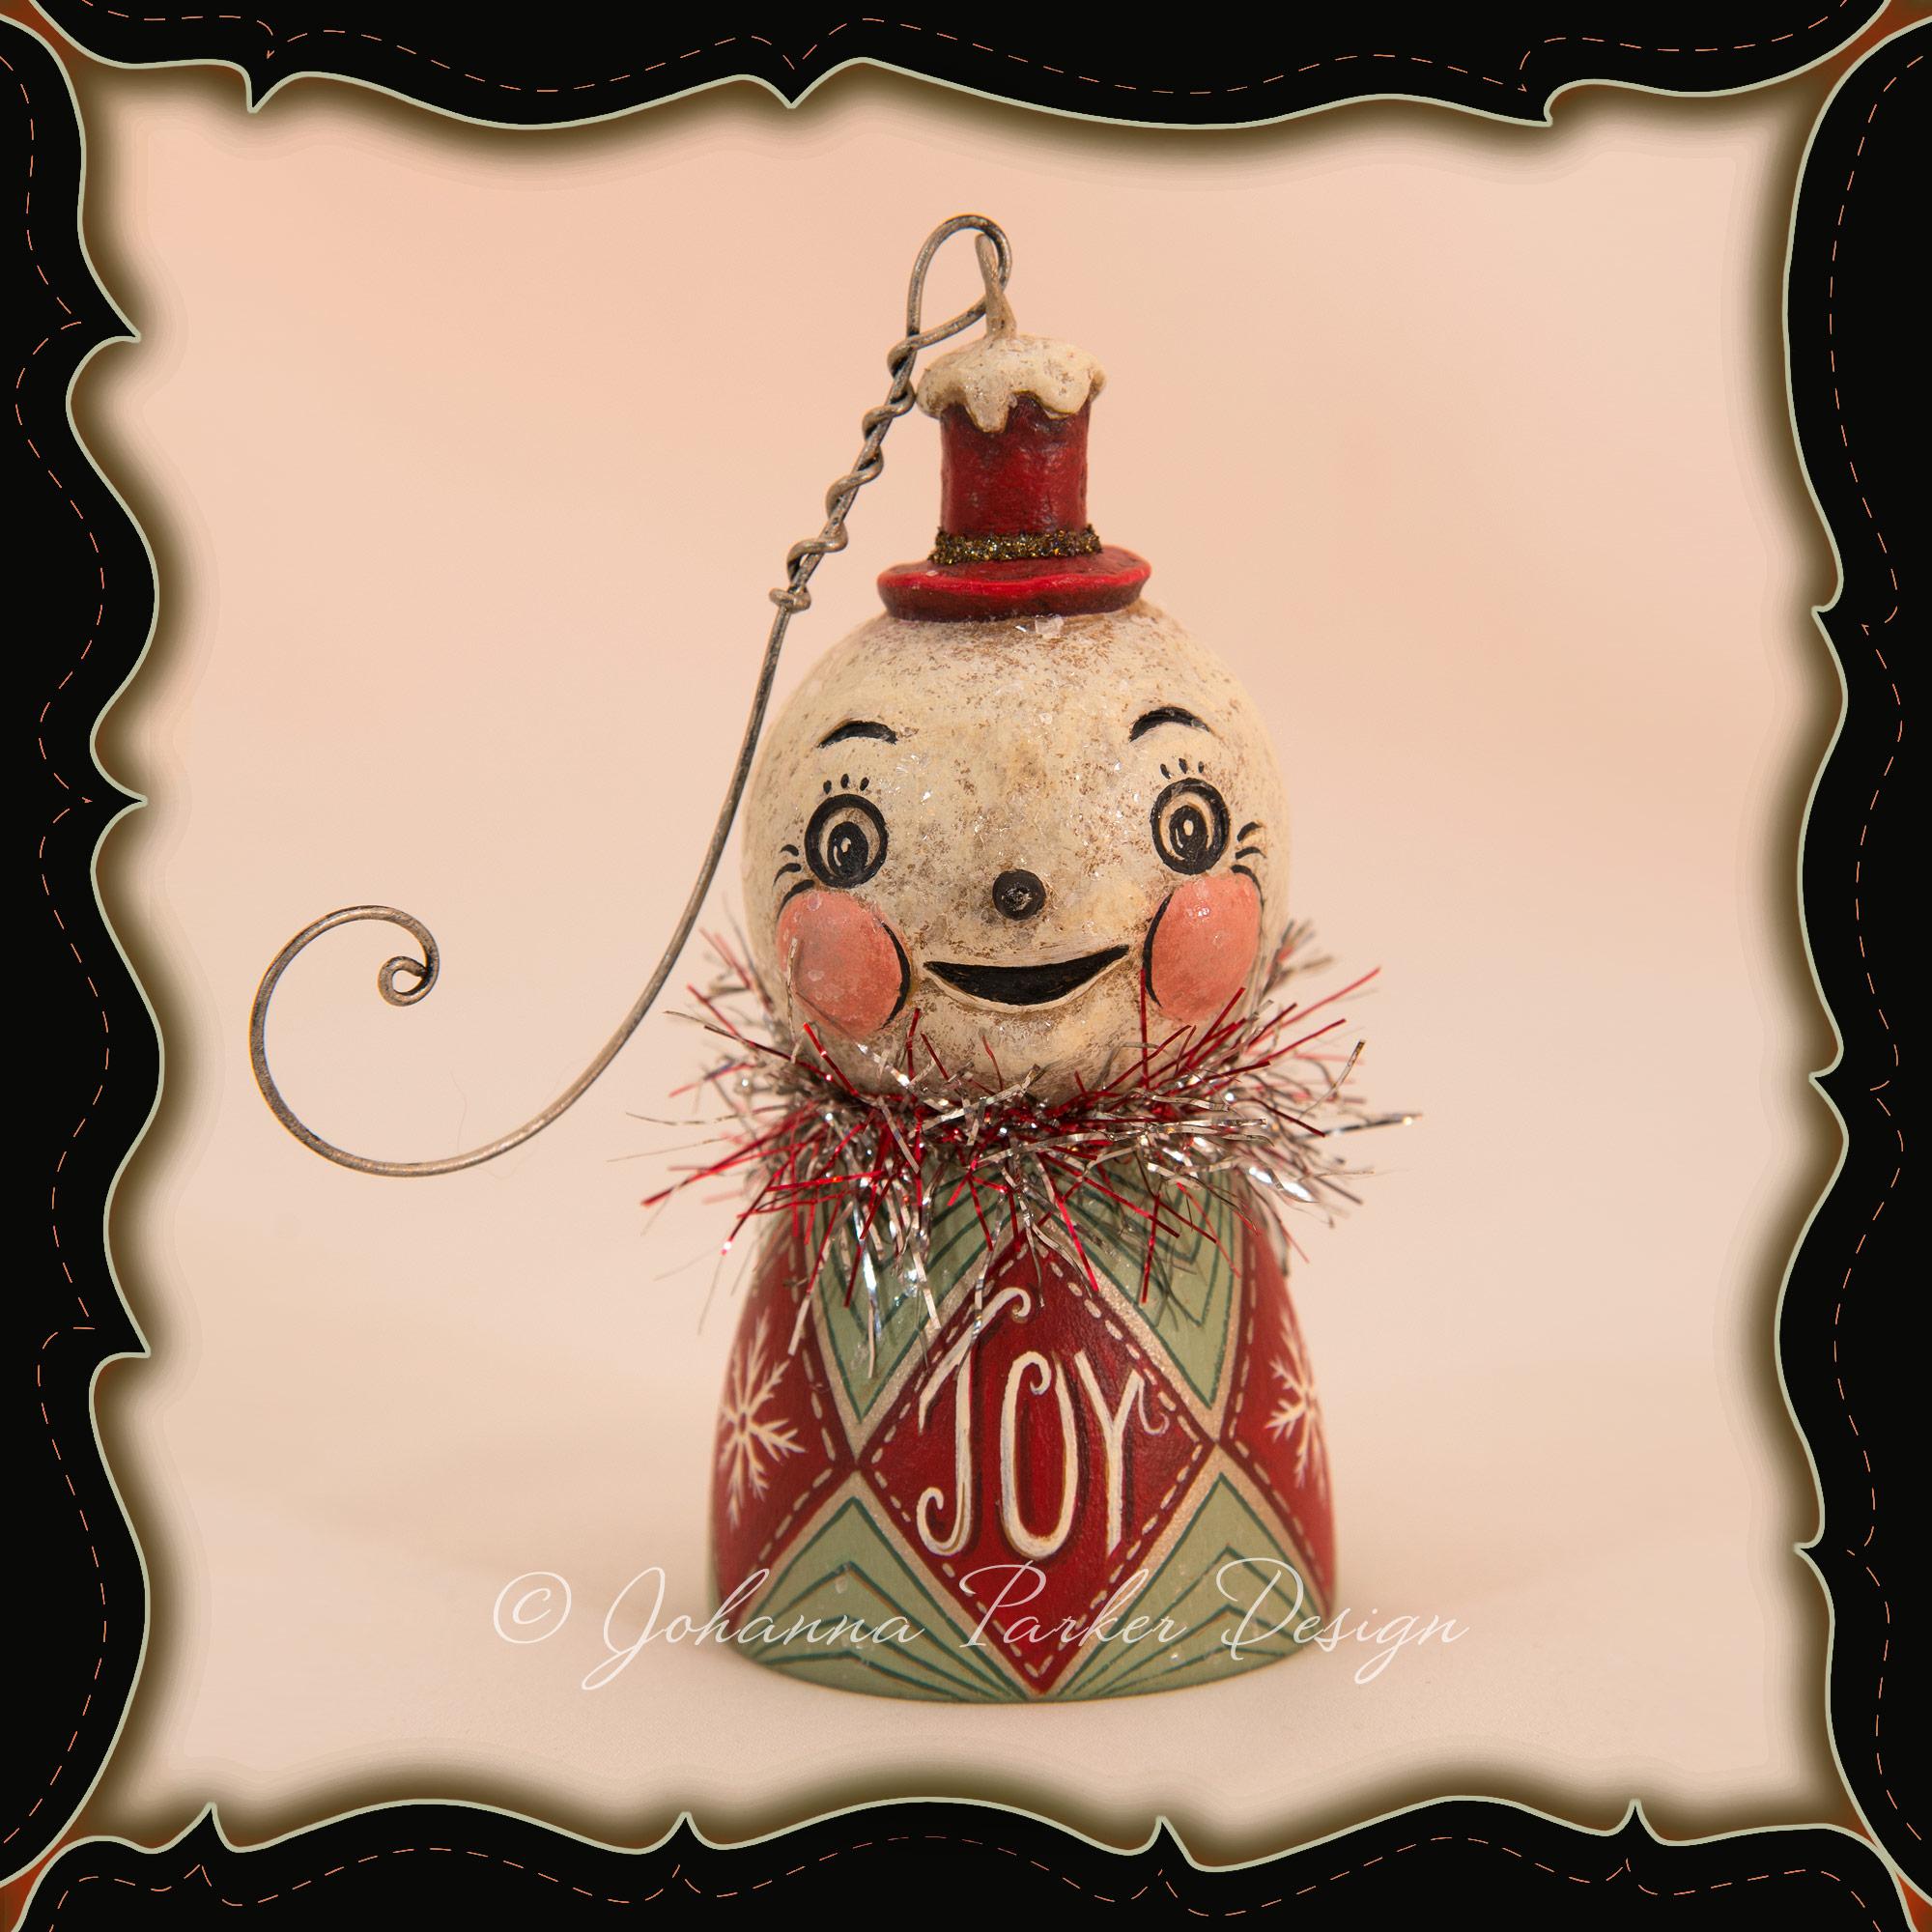 Johanna-Parker-Joy-Snowman-Ornament-Bell-framed.jpg